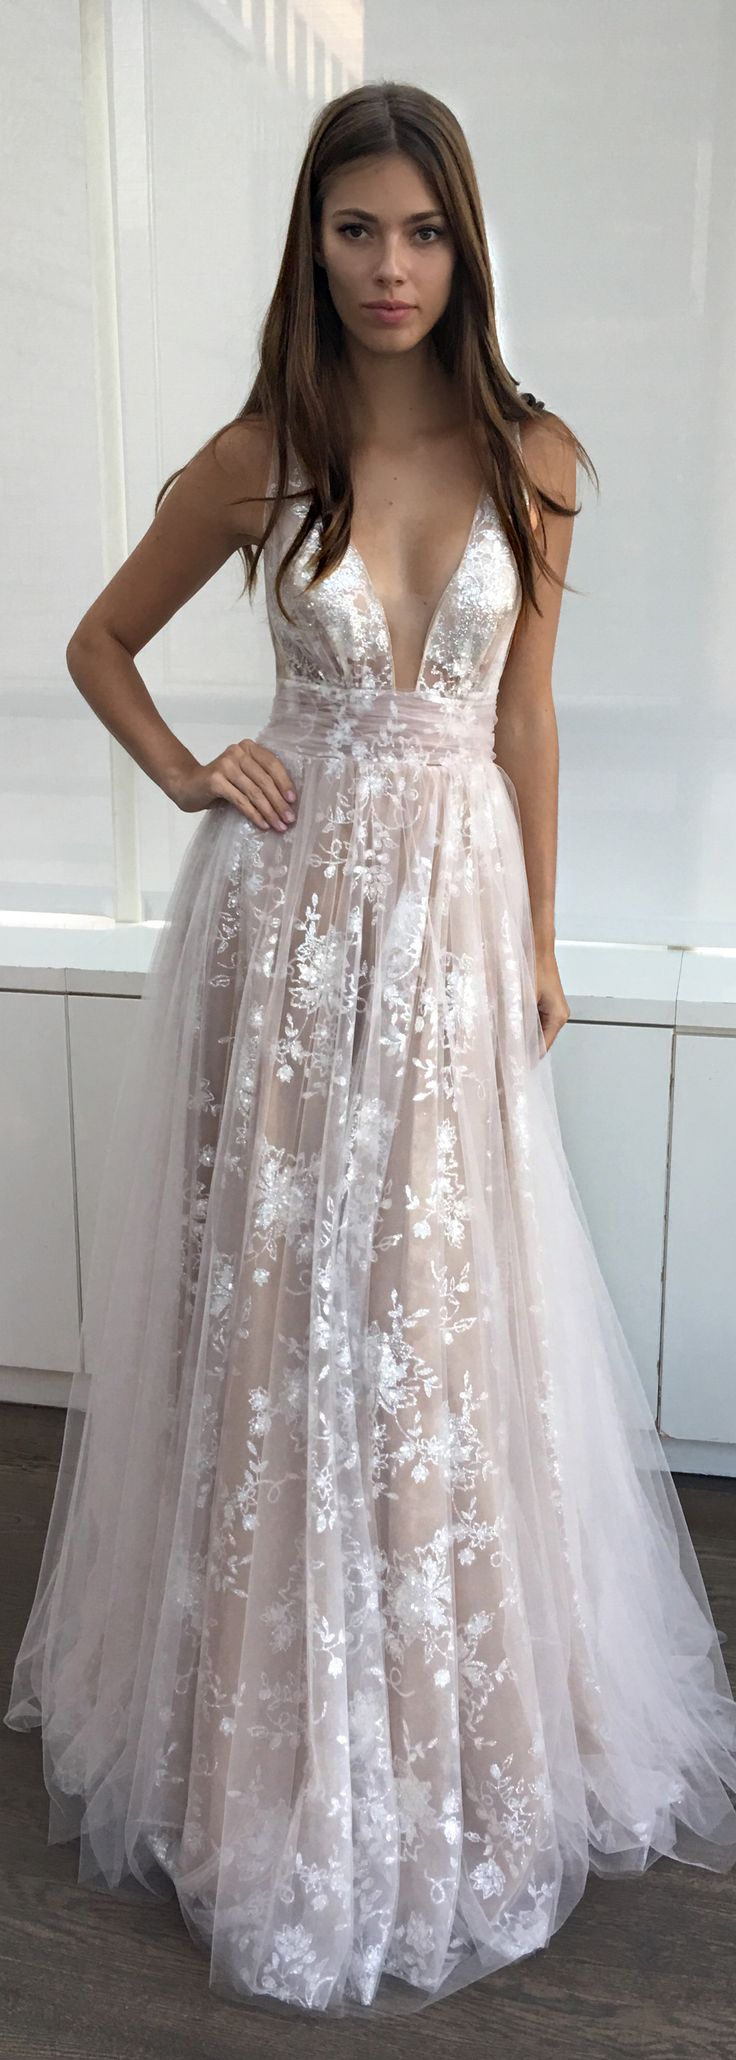 Best 25+ Boho prom dresses ideas on Pinterest | Stunning ...